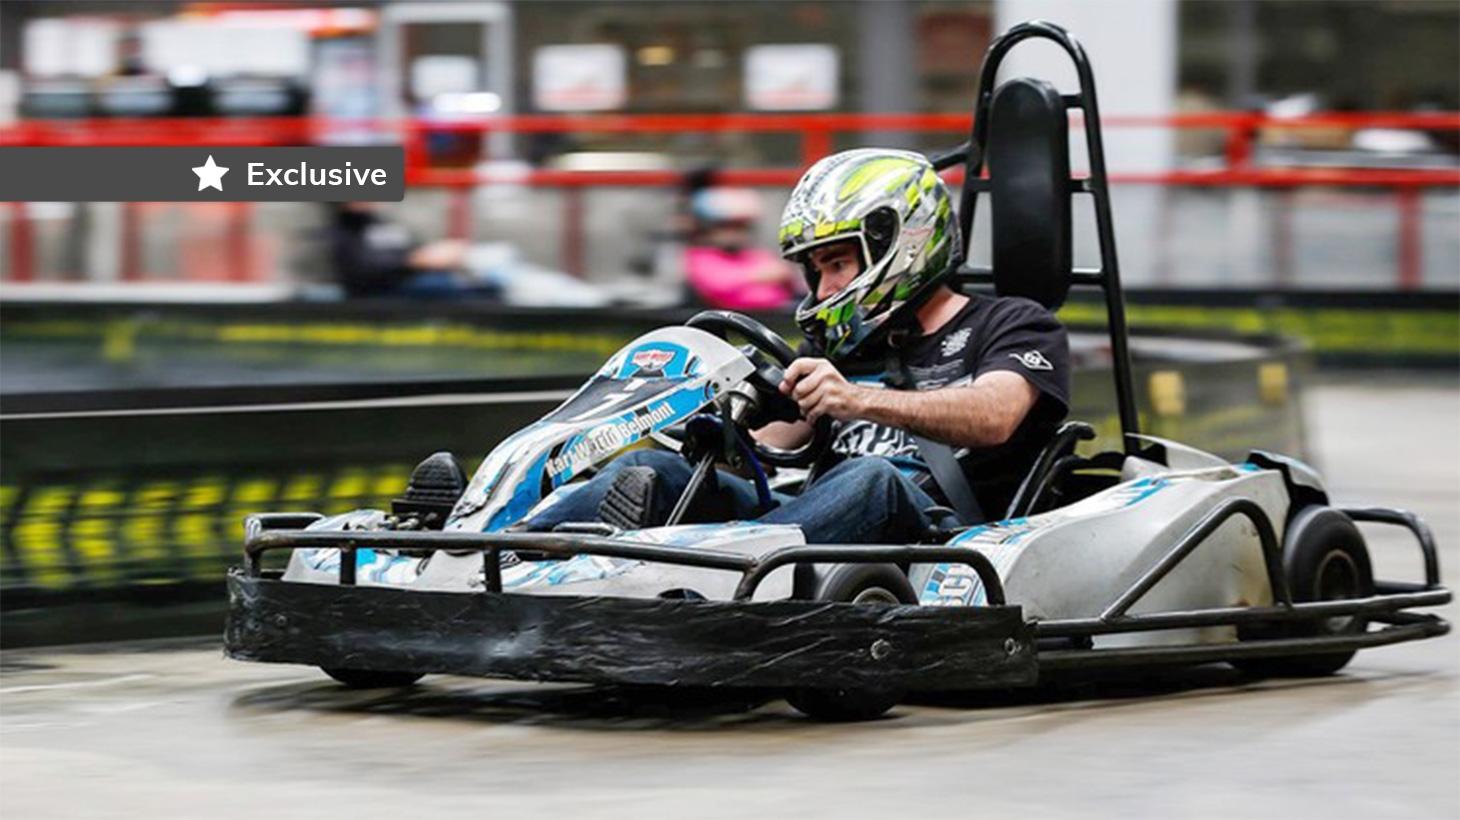 Man riding a Go-Kart doing a lap